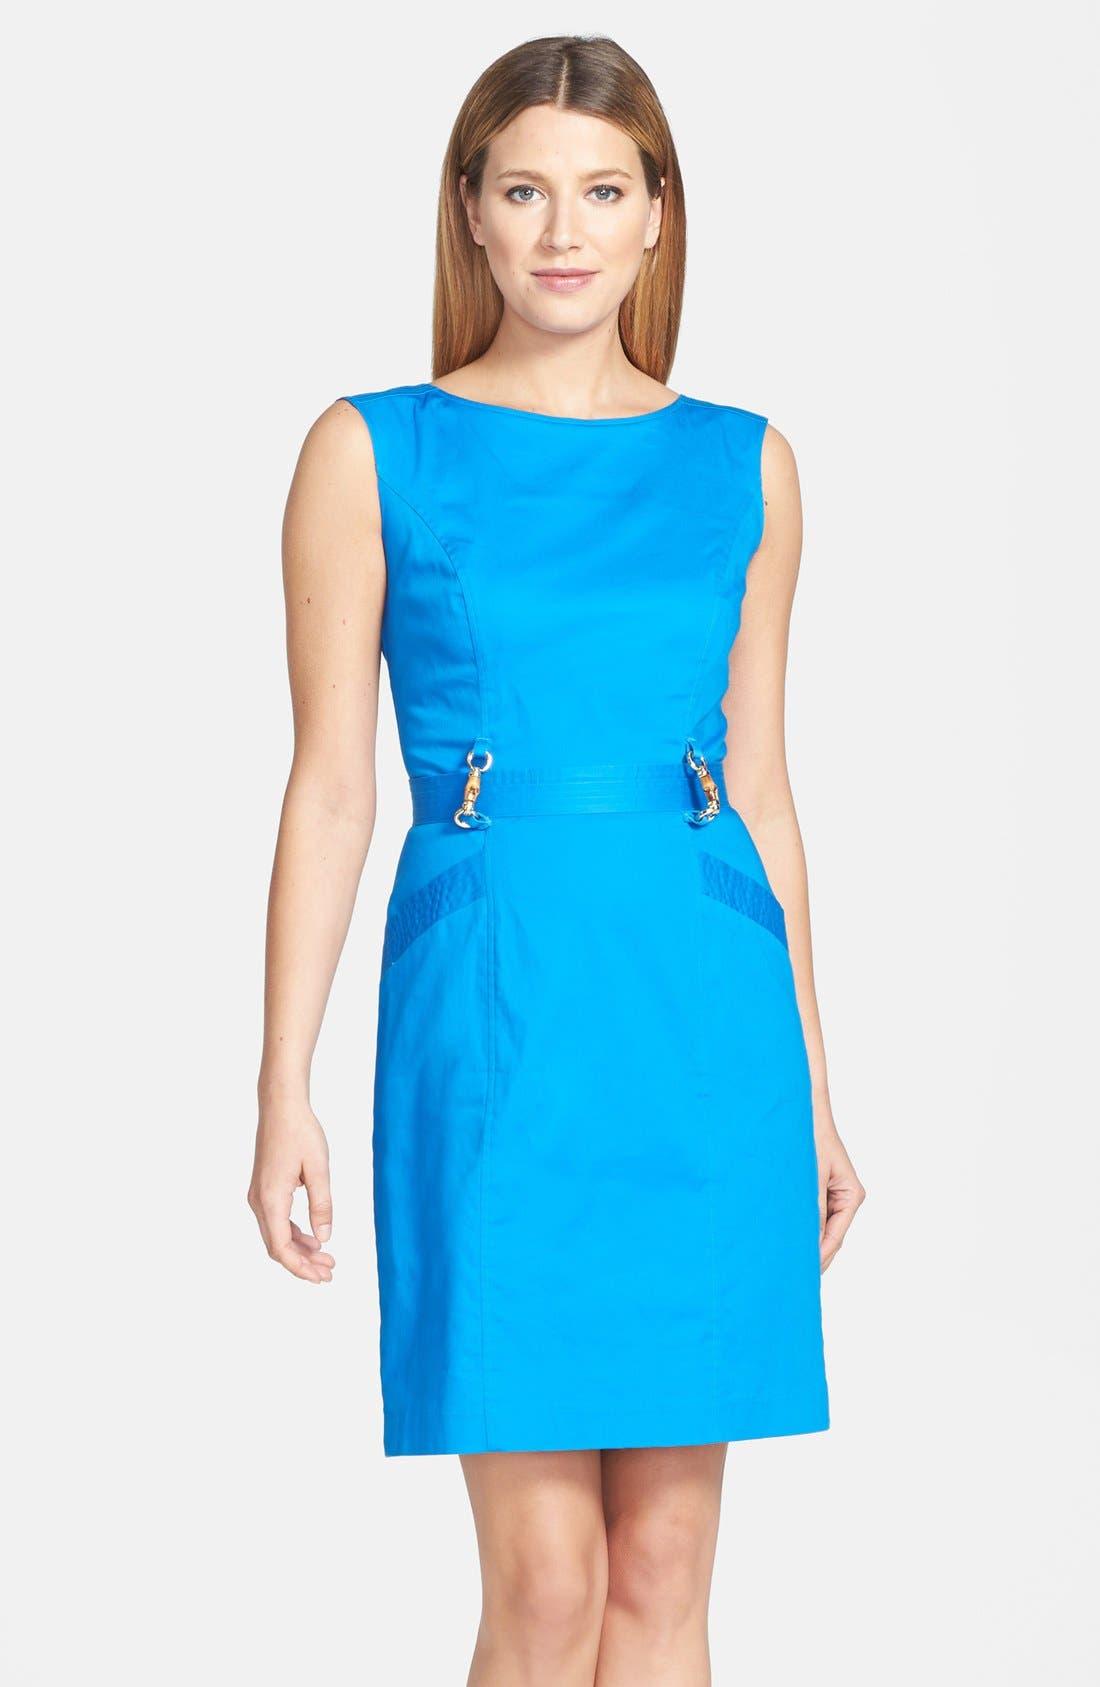 Alternate Image 1 Selected - Ellen Tracy Belted Sleeveless Stretch Cotton Sheath Dress (Regular & Petite)